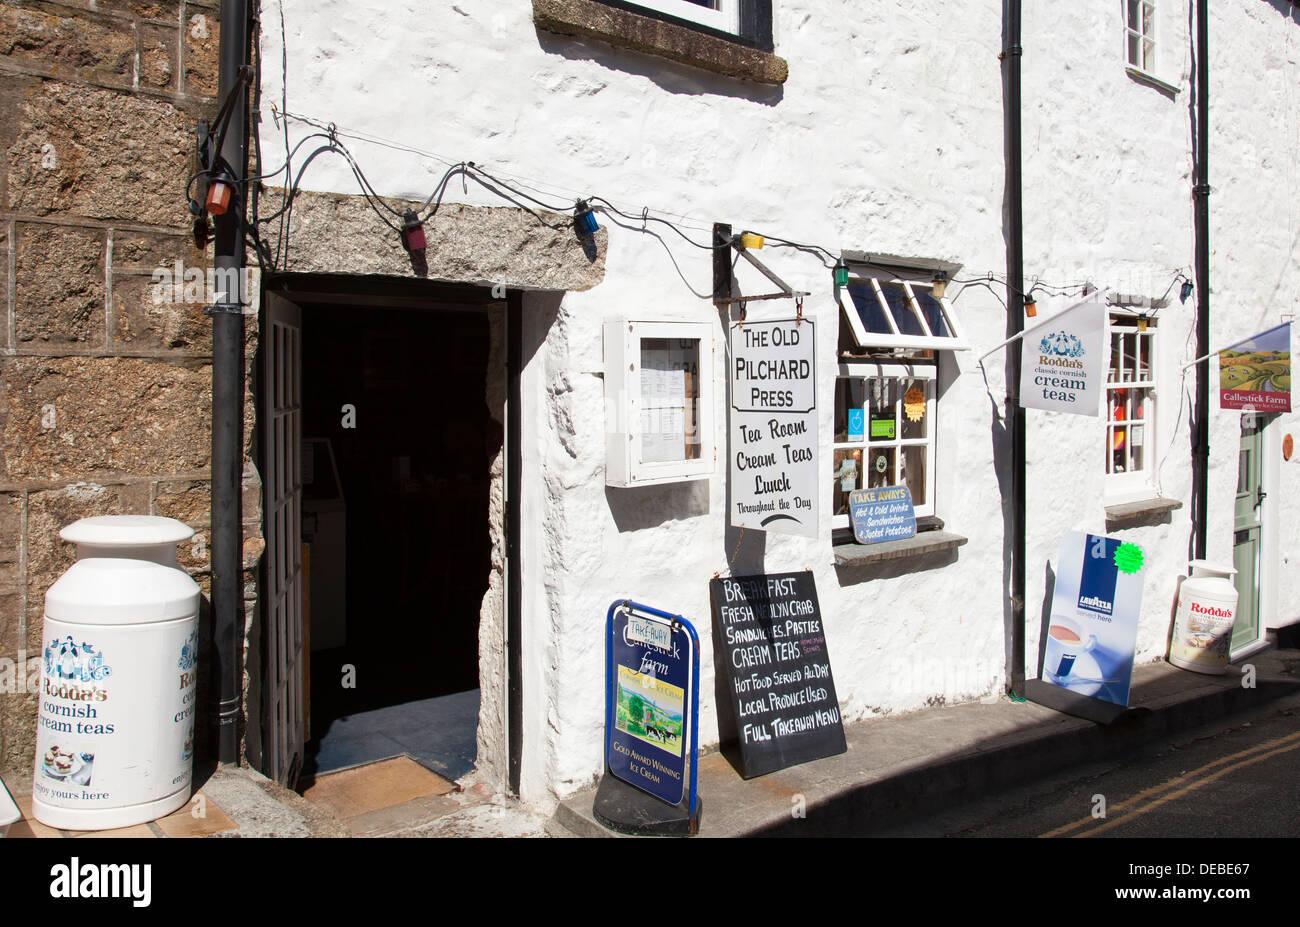 The Old Pilchard Press tea room, Mousehole, Cornwall, England, U.K. - Stock Image